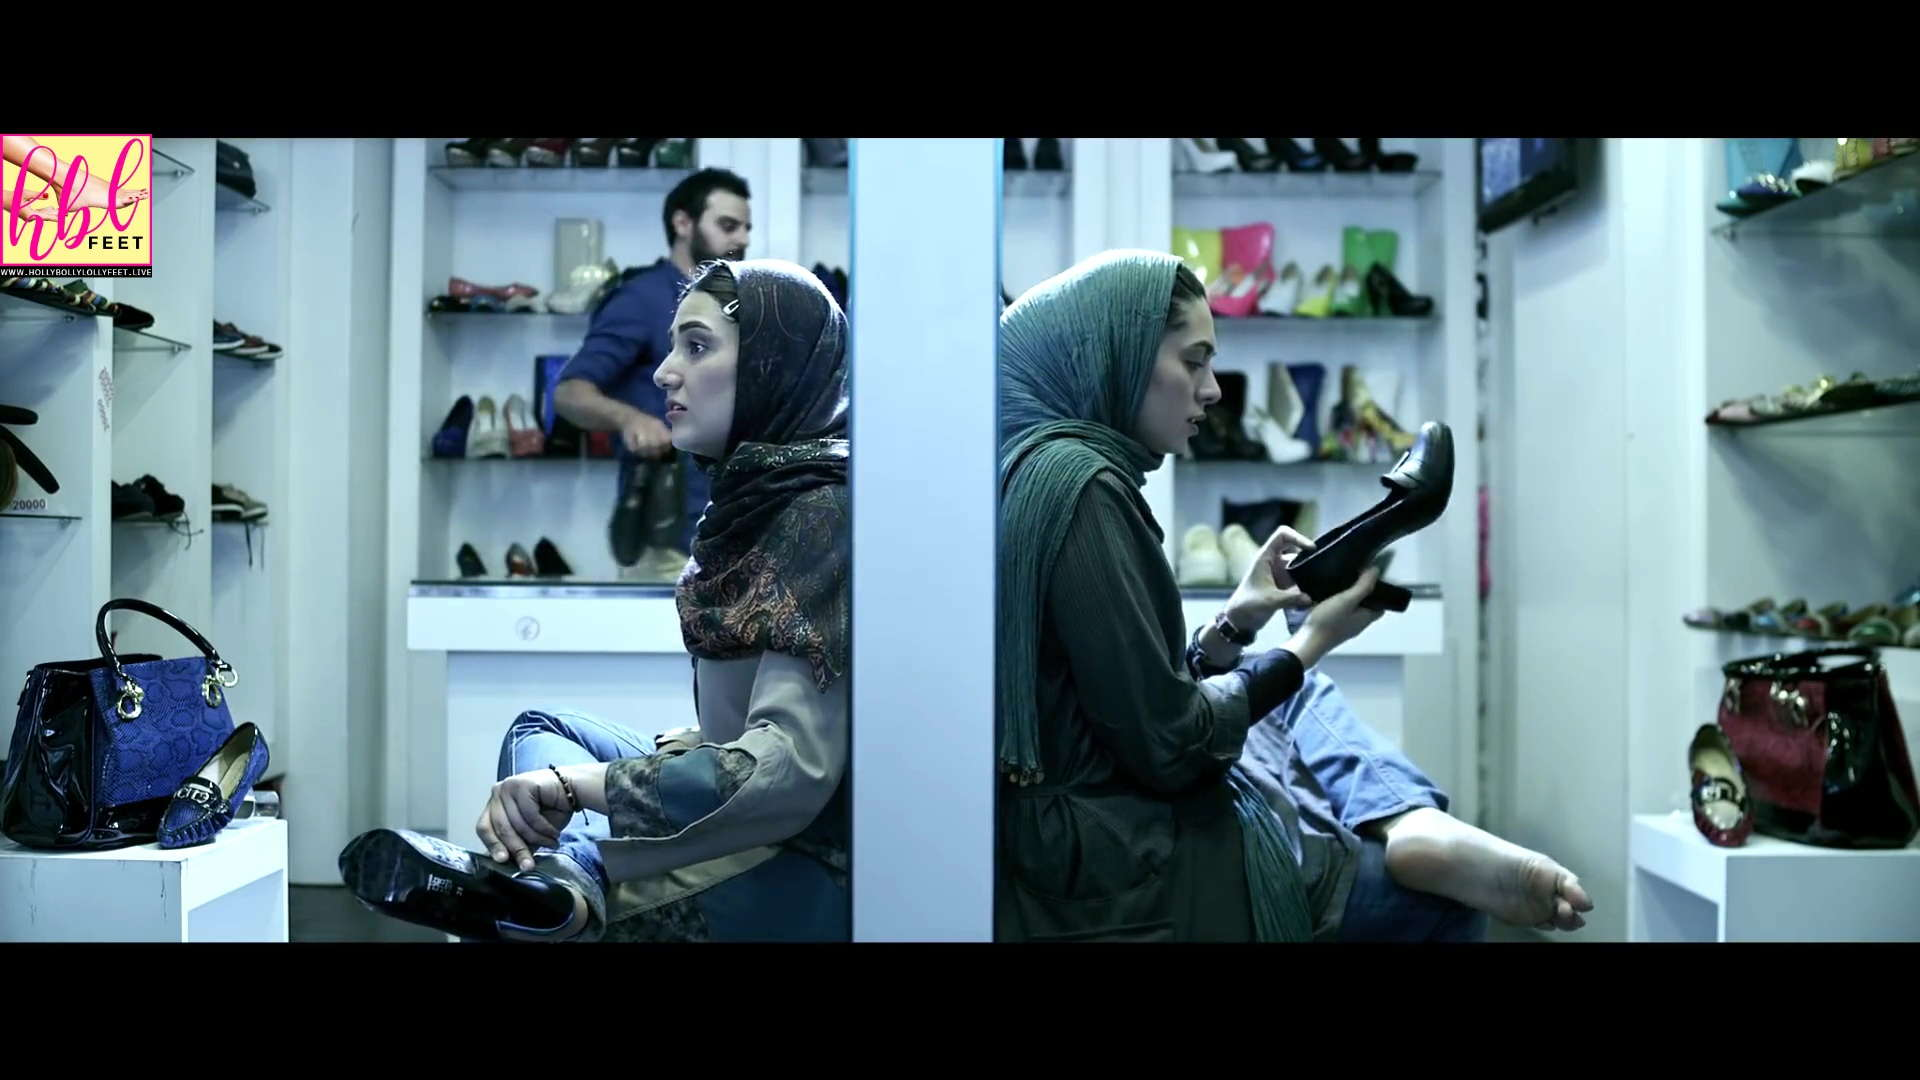 Httpsjamesrobison Usfilm Dokhtar Irani: Holly Bolly Lolly Feet (HBL Feet)